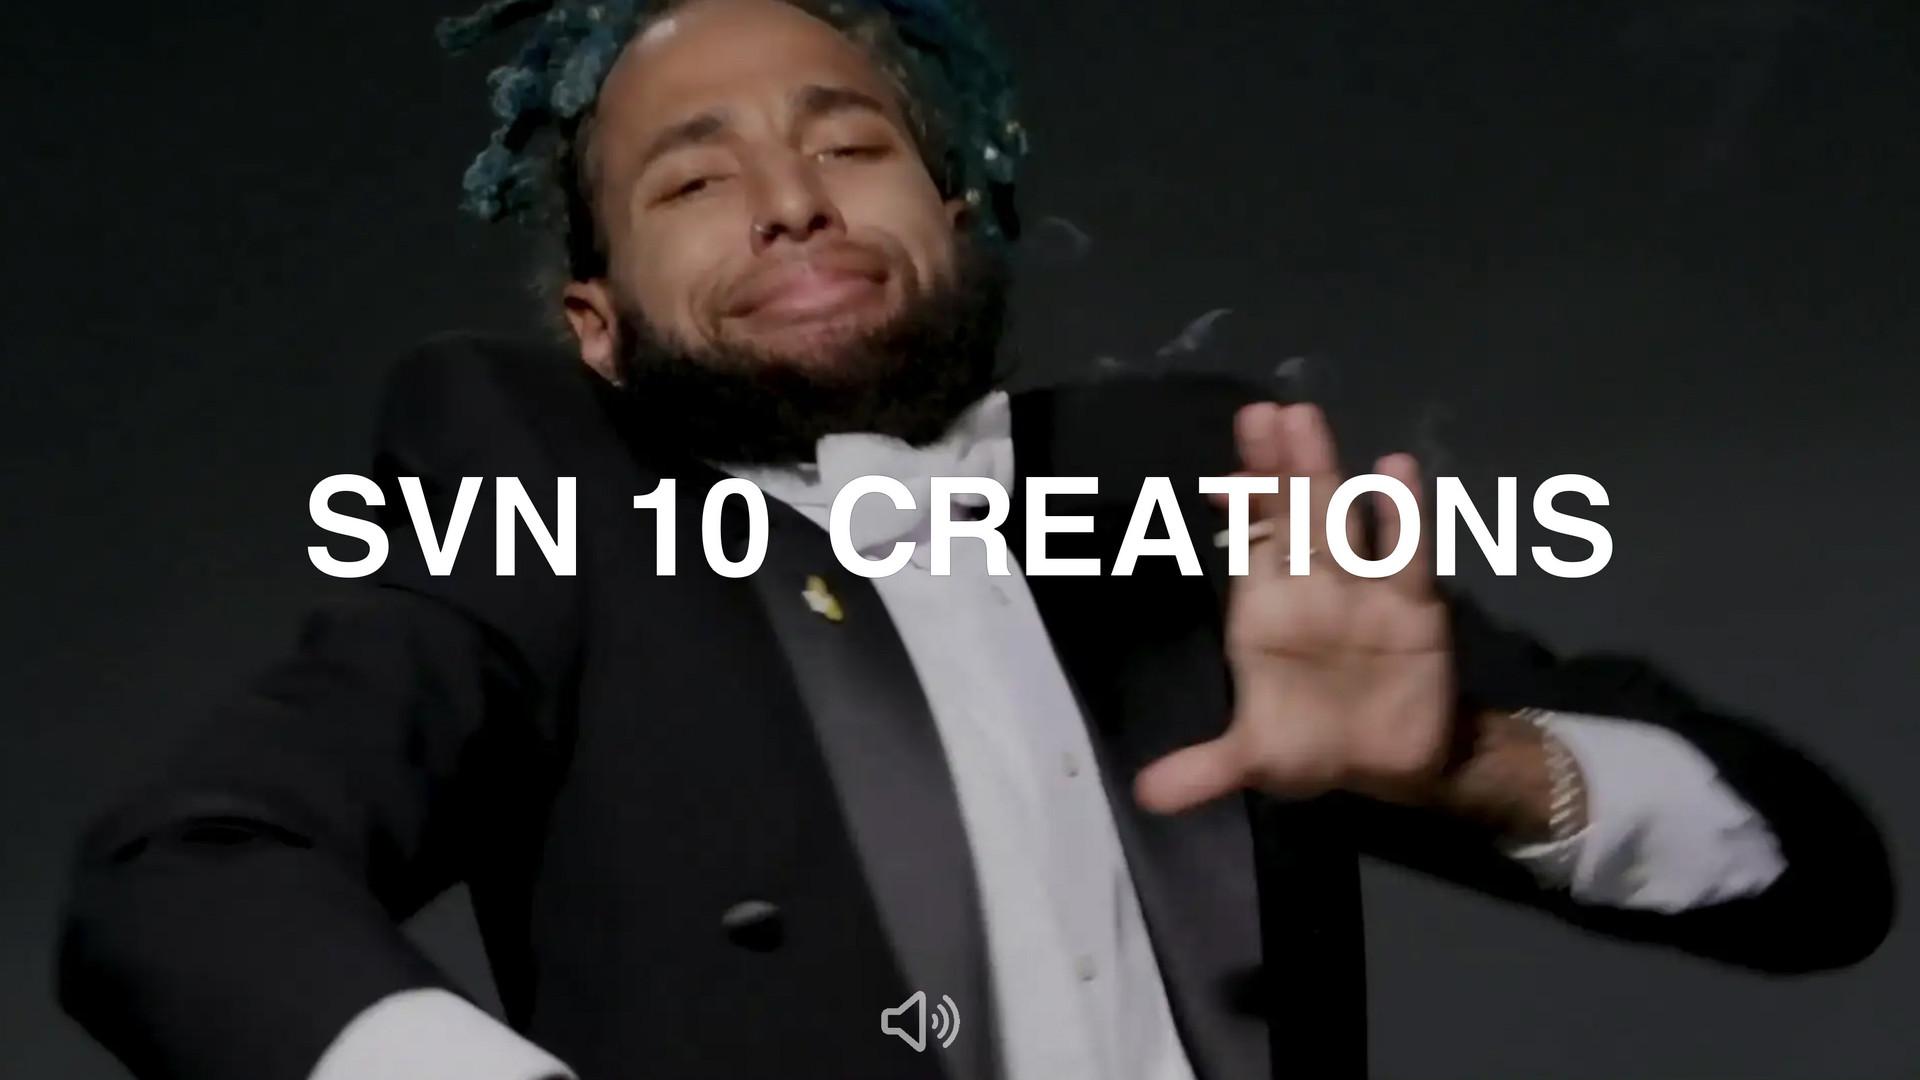 Seven Ten Creations  - Cannabis pre-roll company social media add.